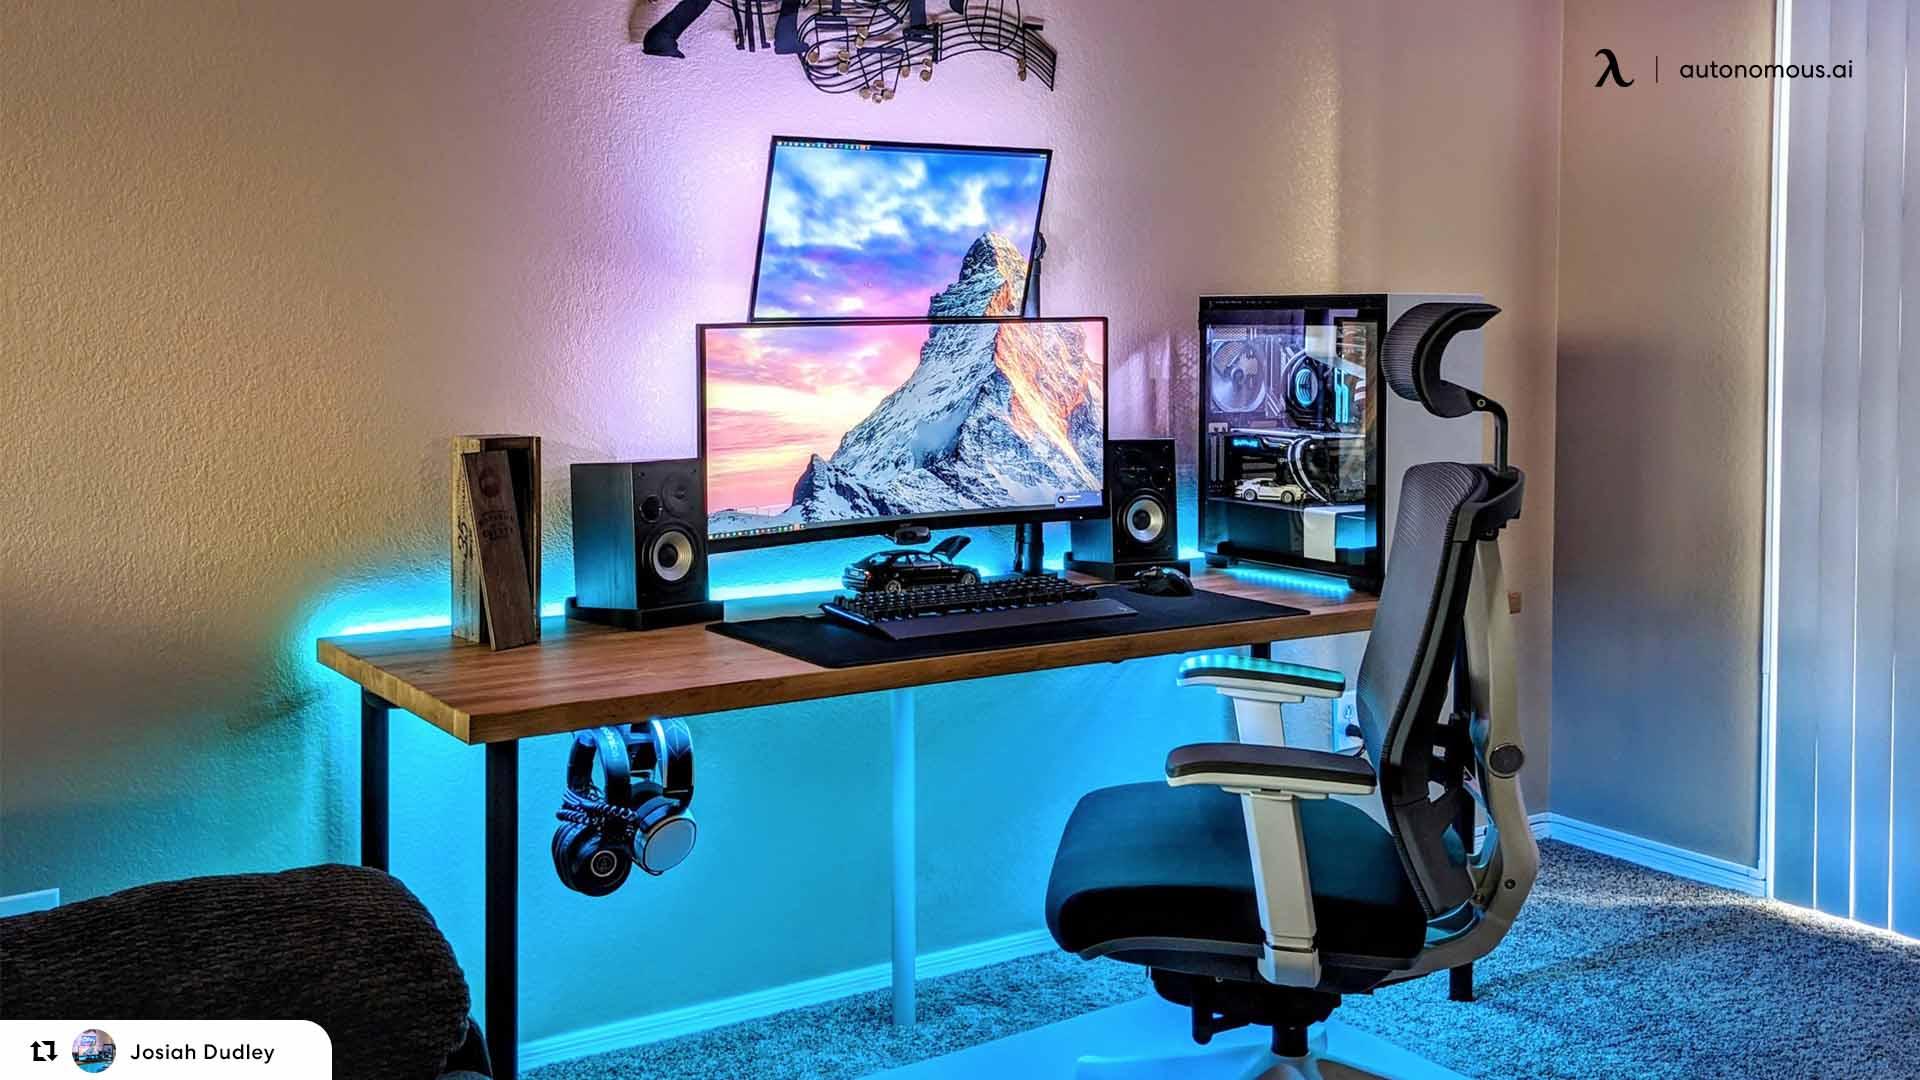 ergonomic chairs and standing desks